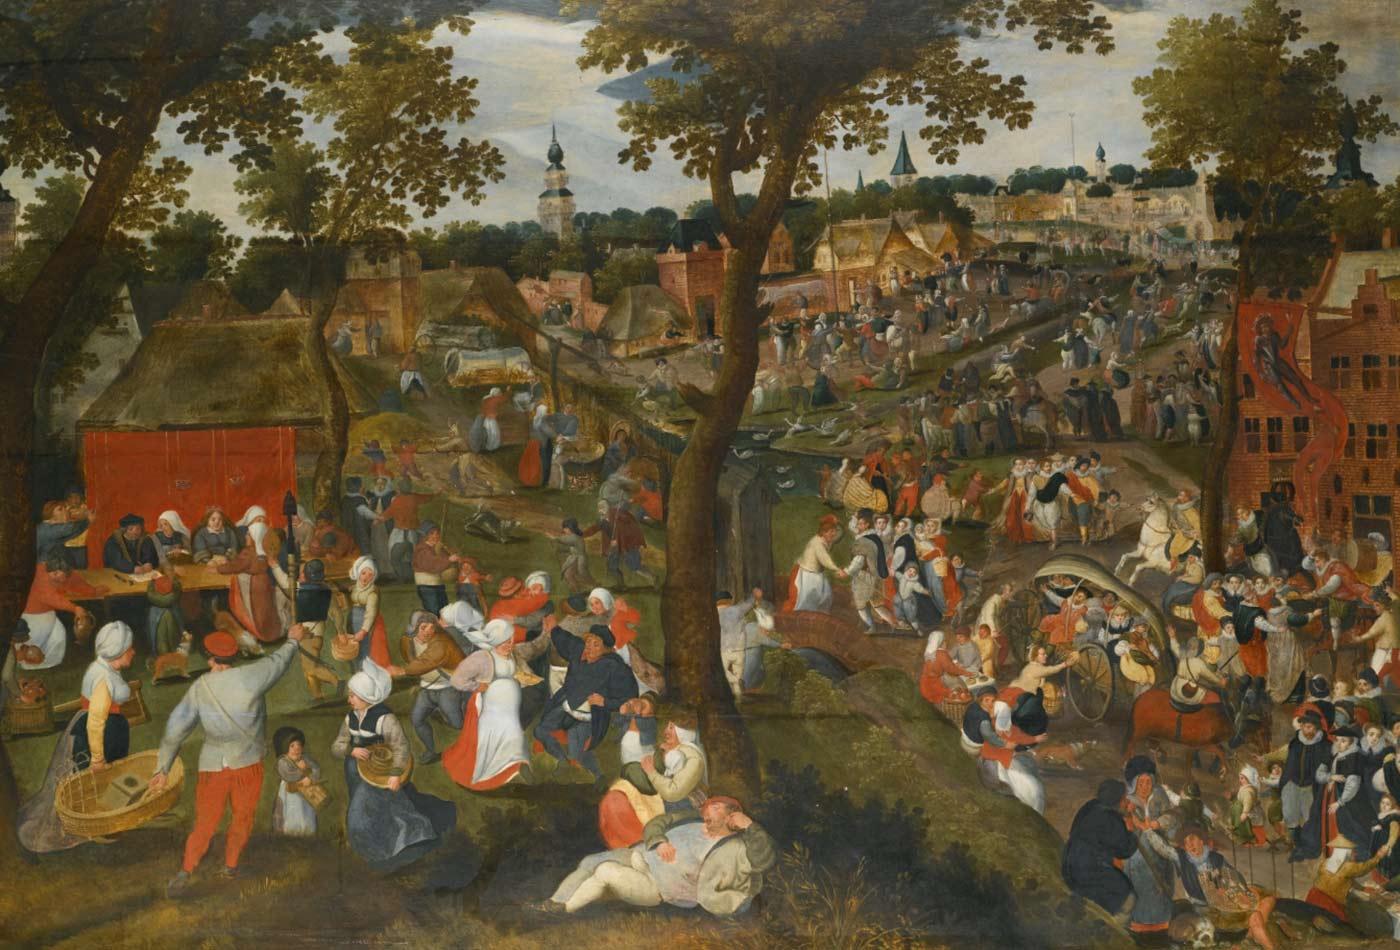 A village celebrating the kermesse of Saint Sebastian.